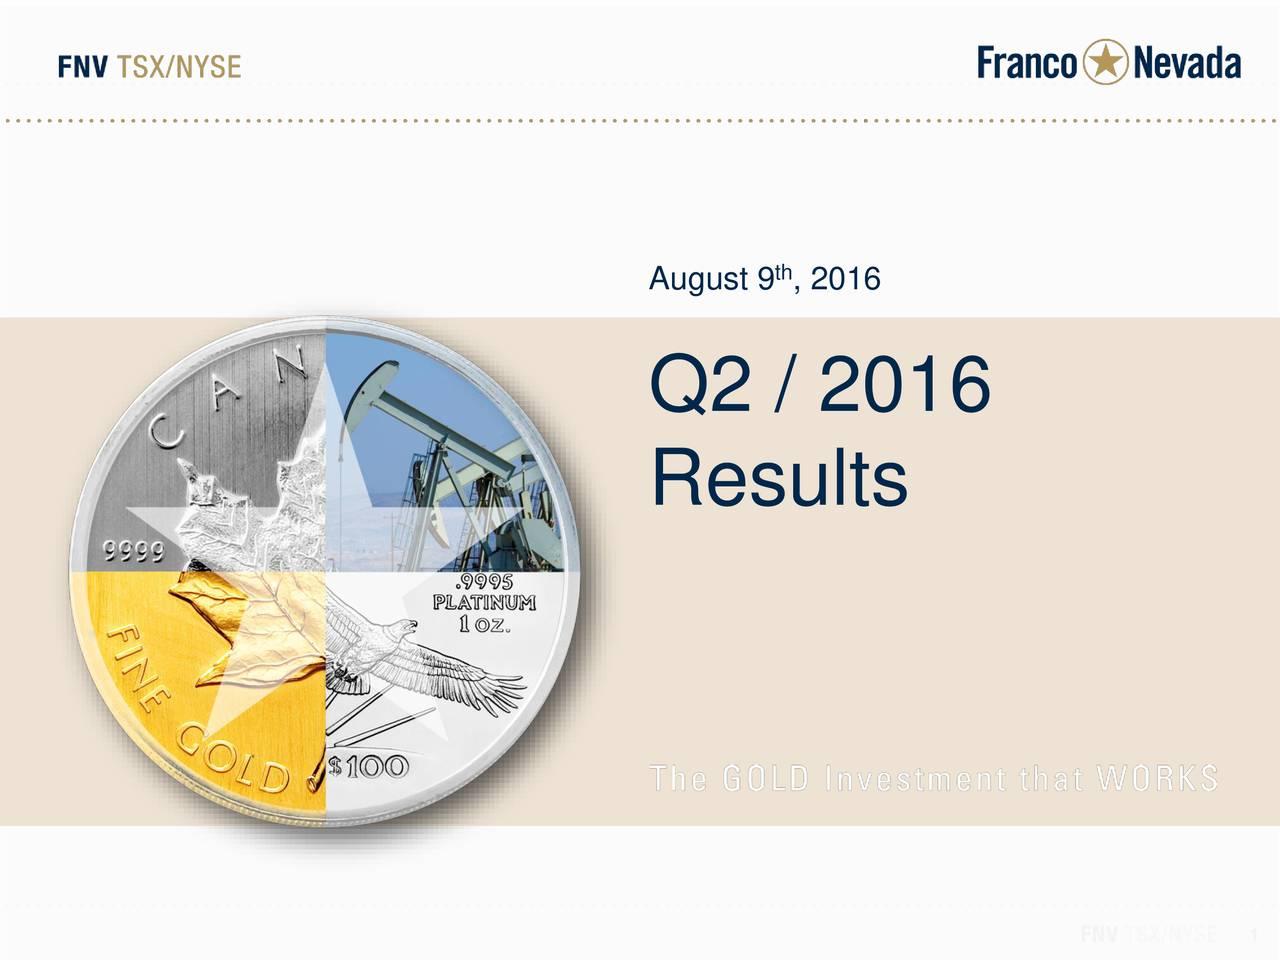 Q2 / 2016 Results